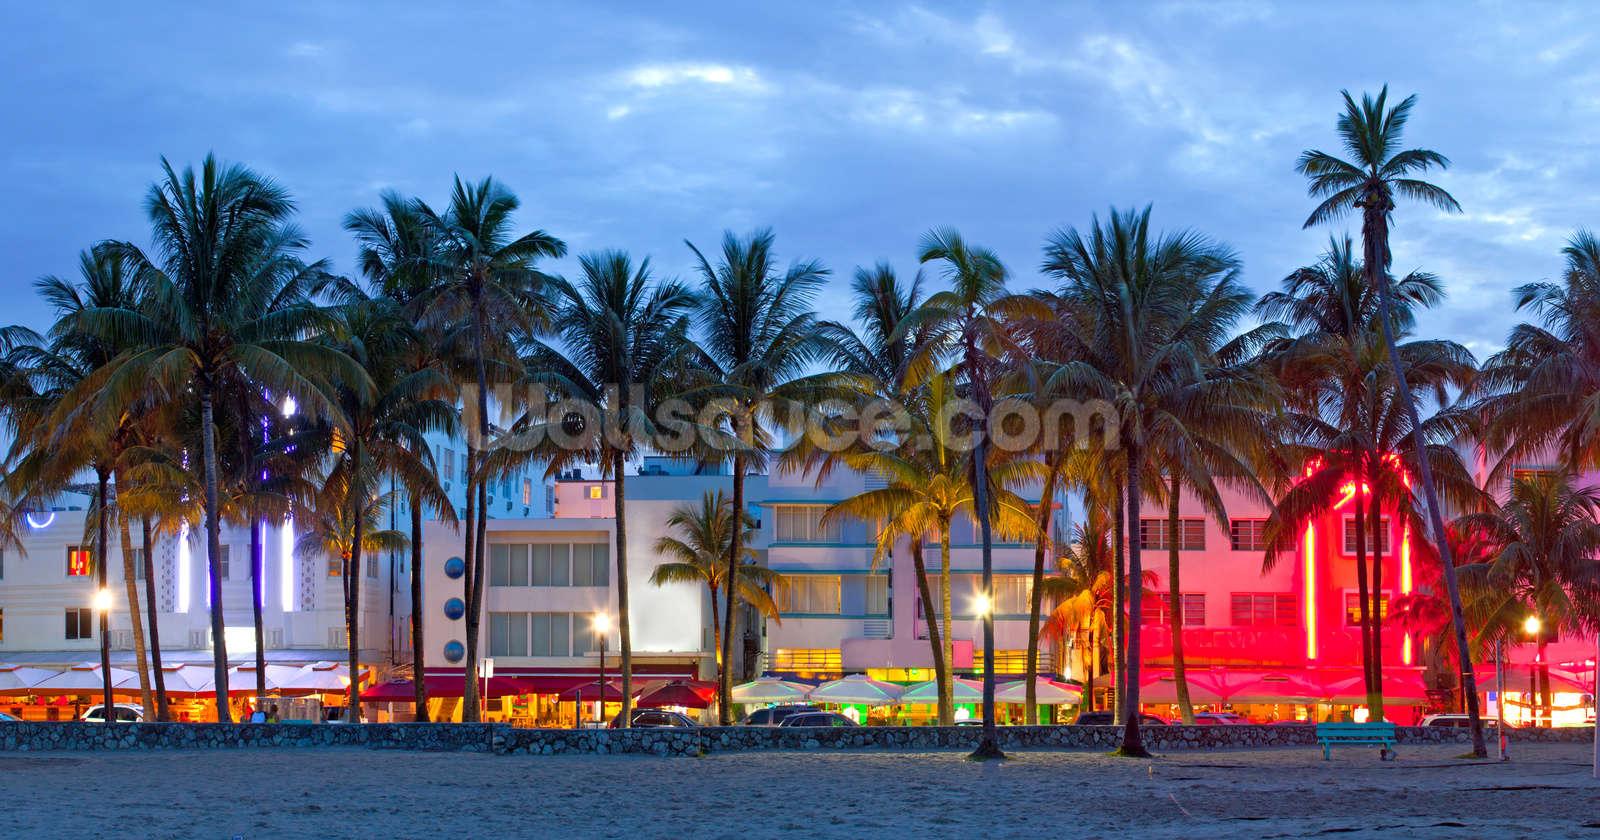 Miami Beach Palms Sunset Mural Wallpaper